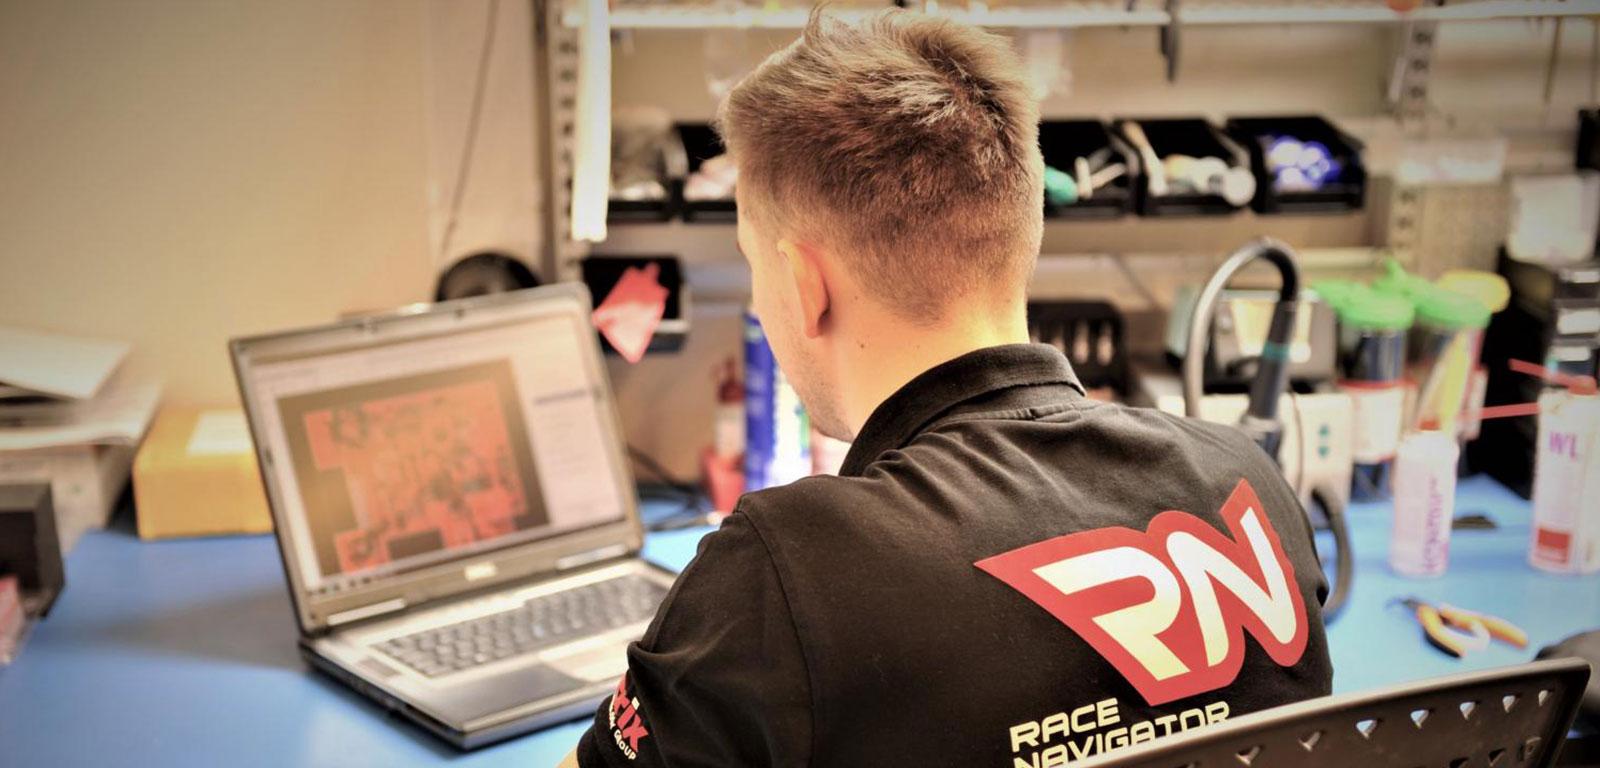 RN Race Navigator App